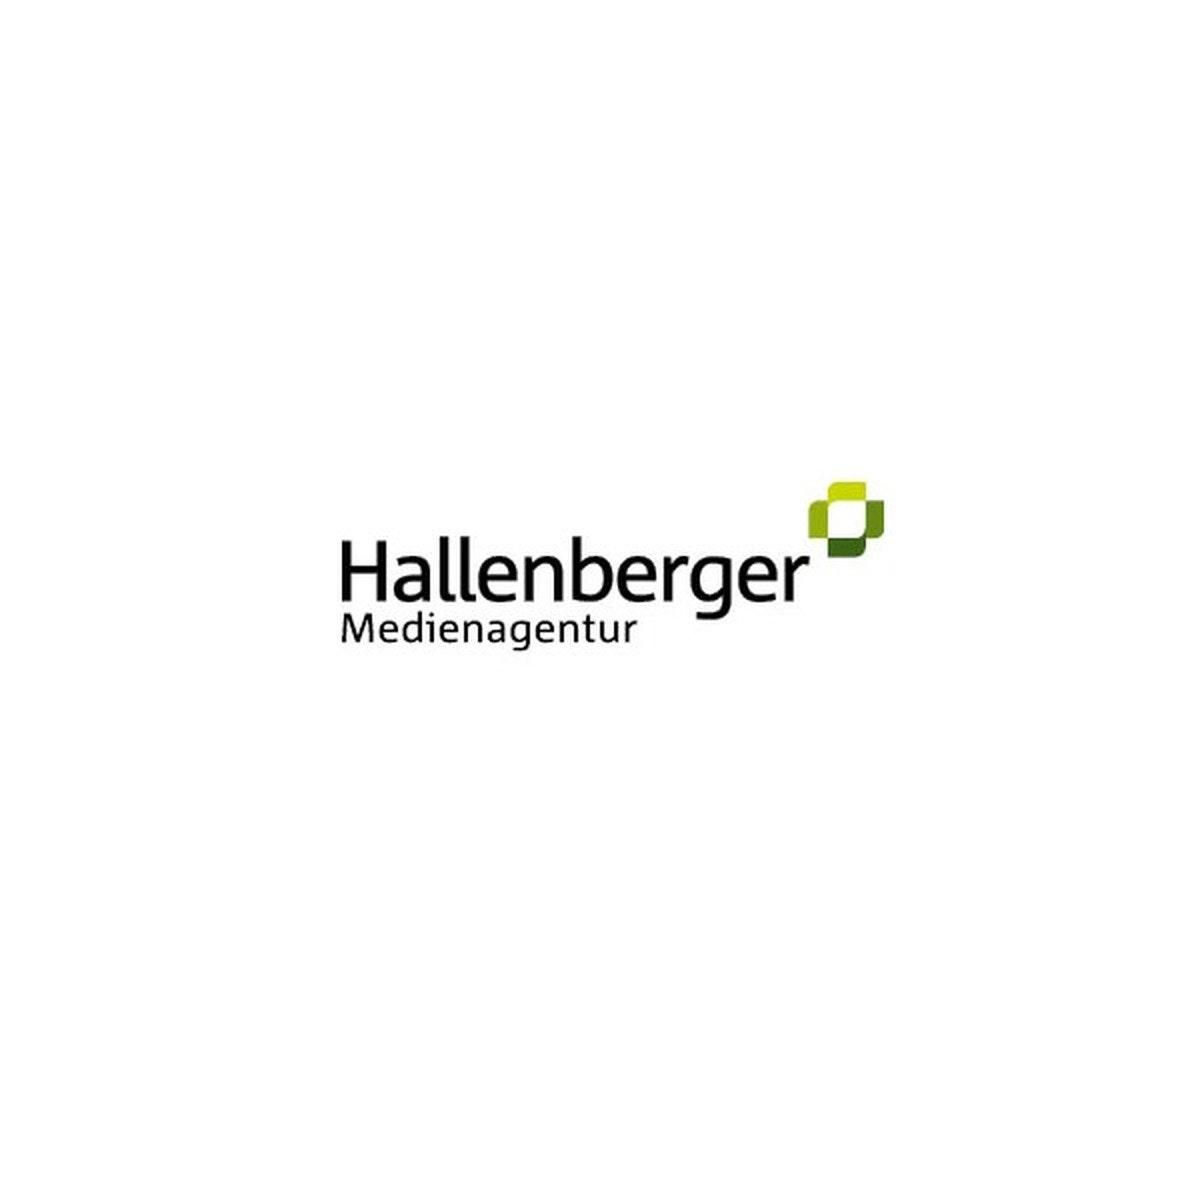 Medienagentur Hallenberger